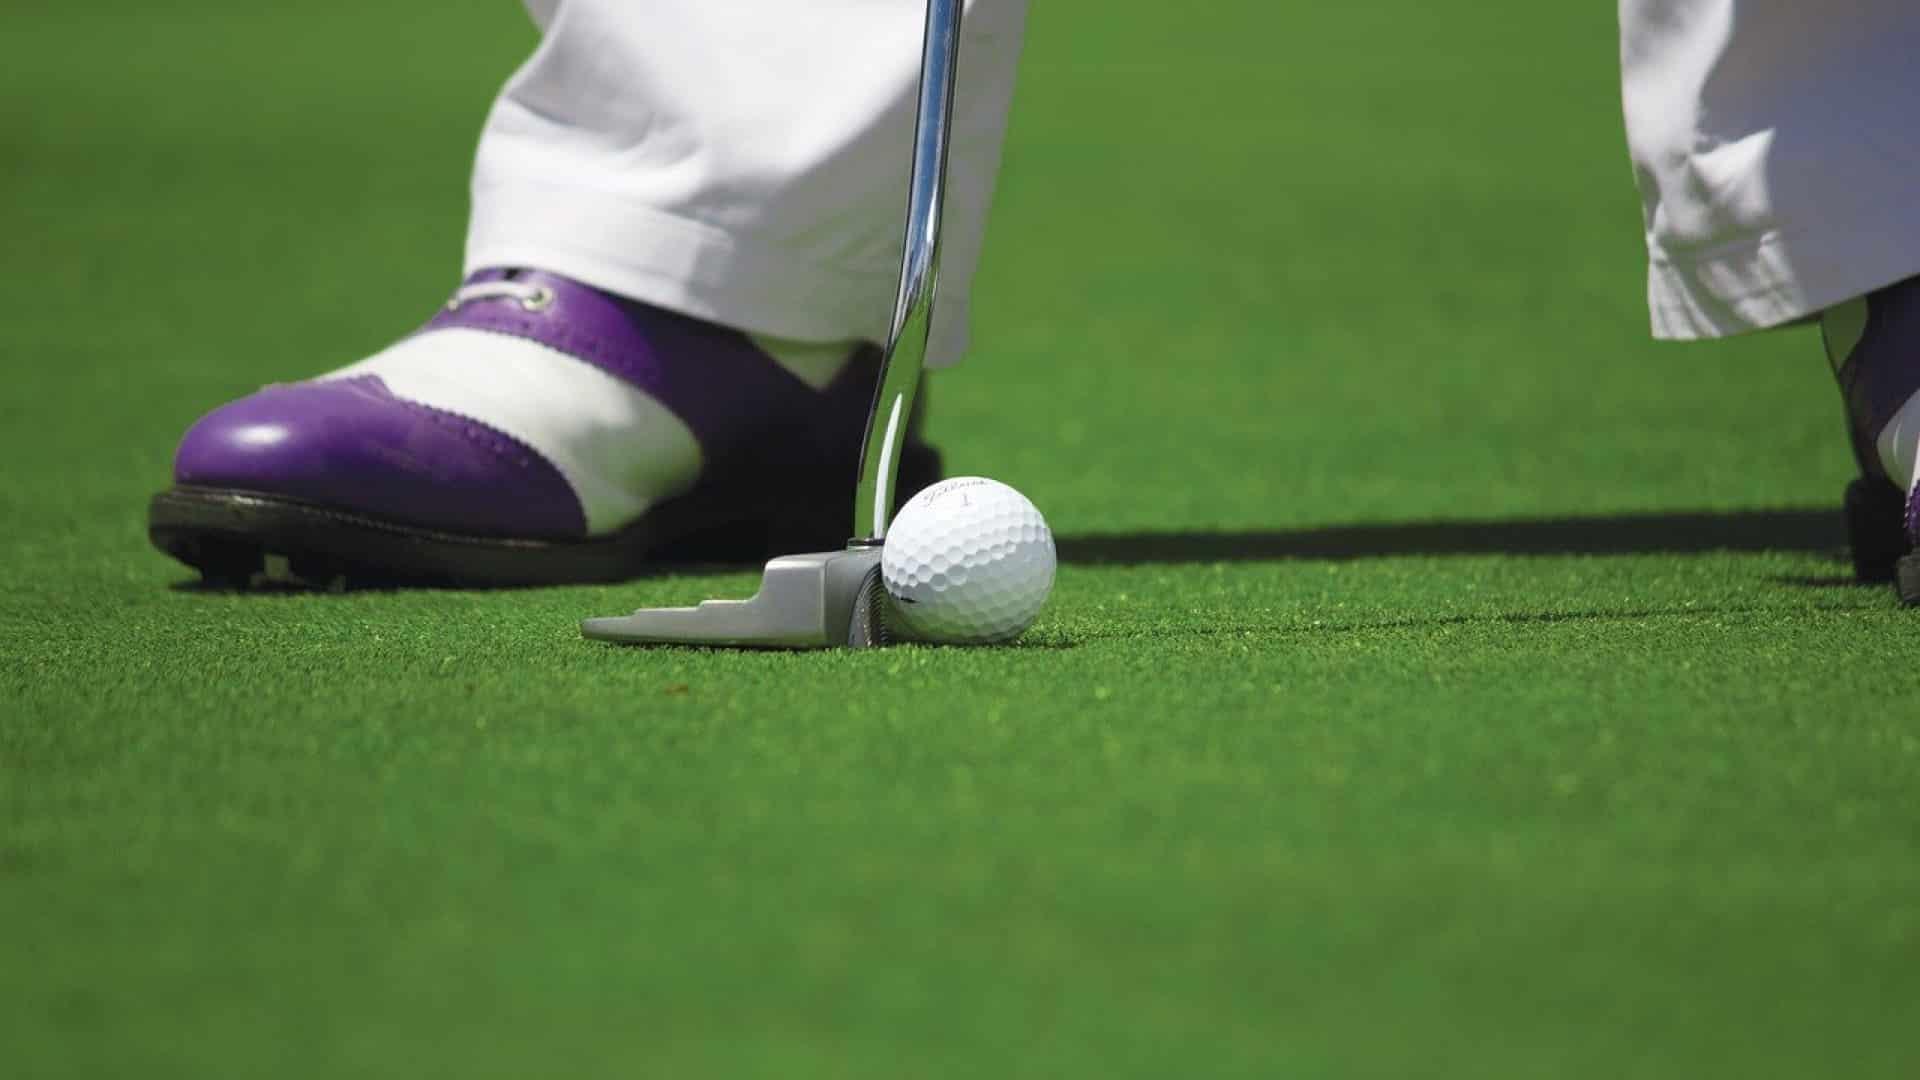 Comment commencer le golf ?